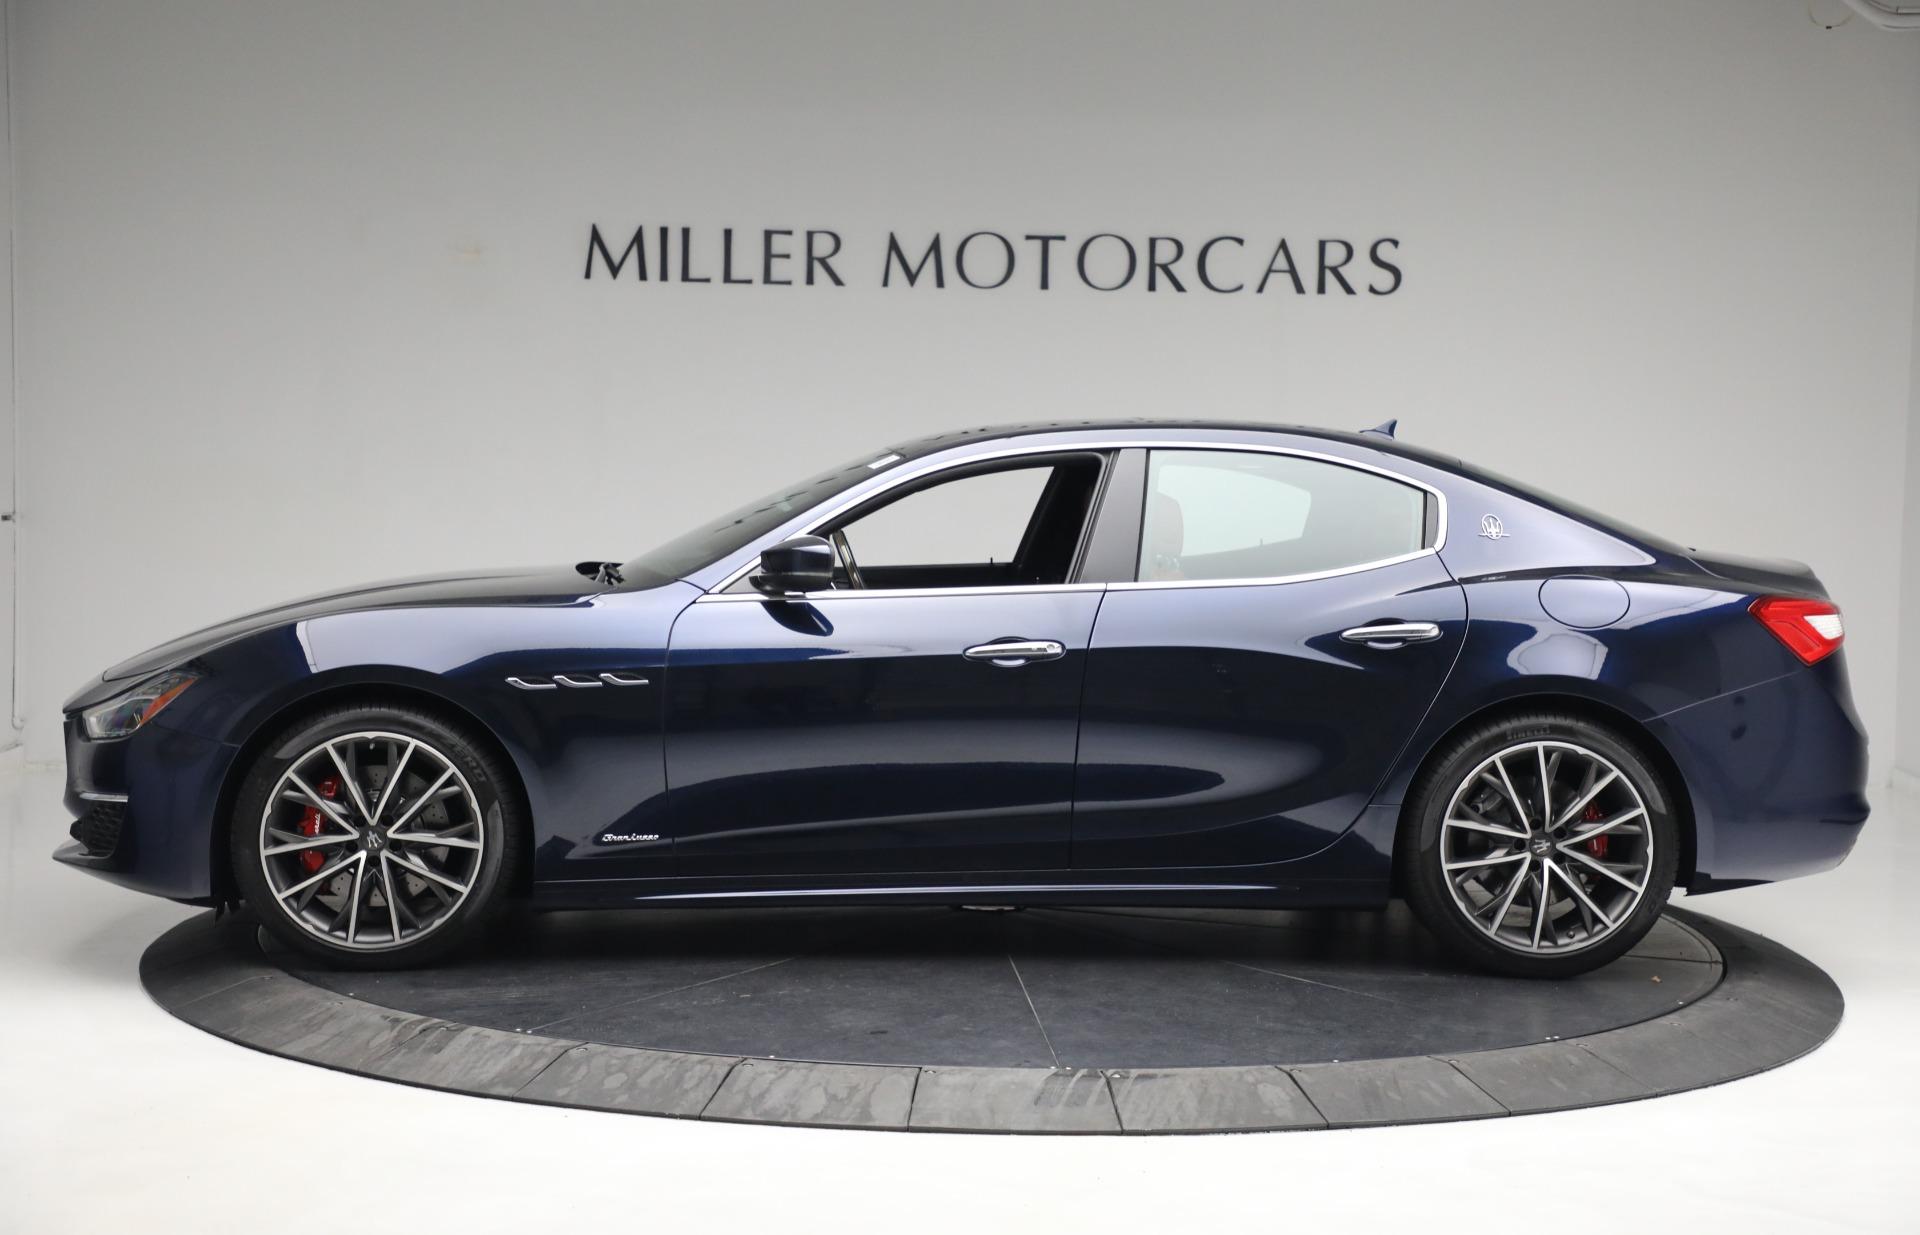 New 2019 Maserati Ghibli S Q4 GranLusso For Sale In Westport, CT 2798_p3